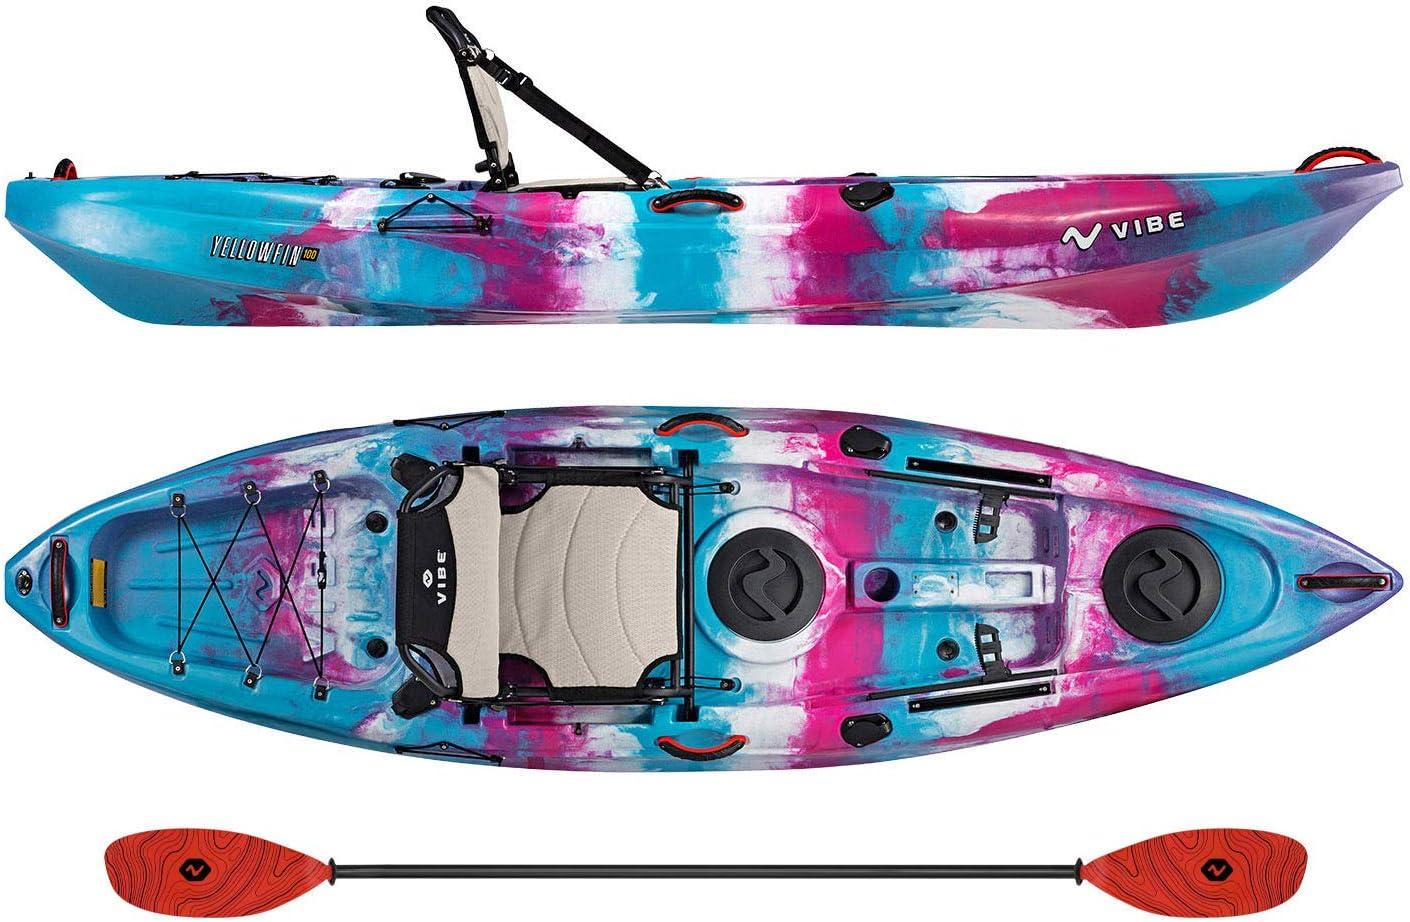 Where Are Vibe Kayaks Made?